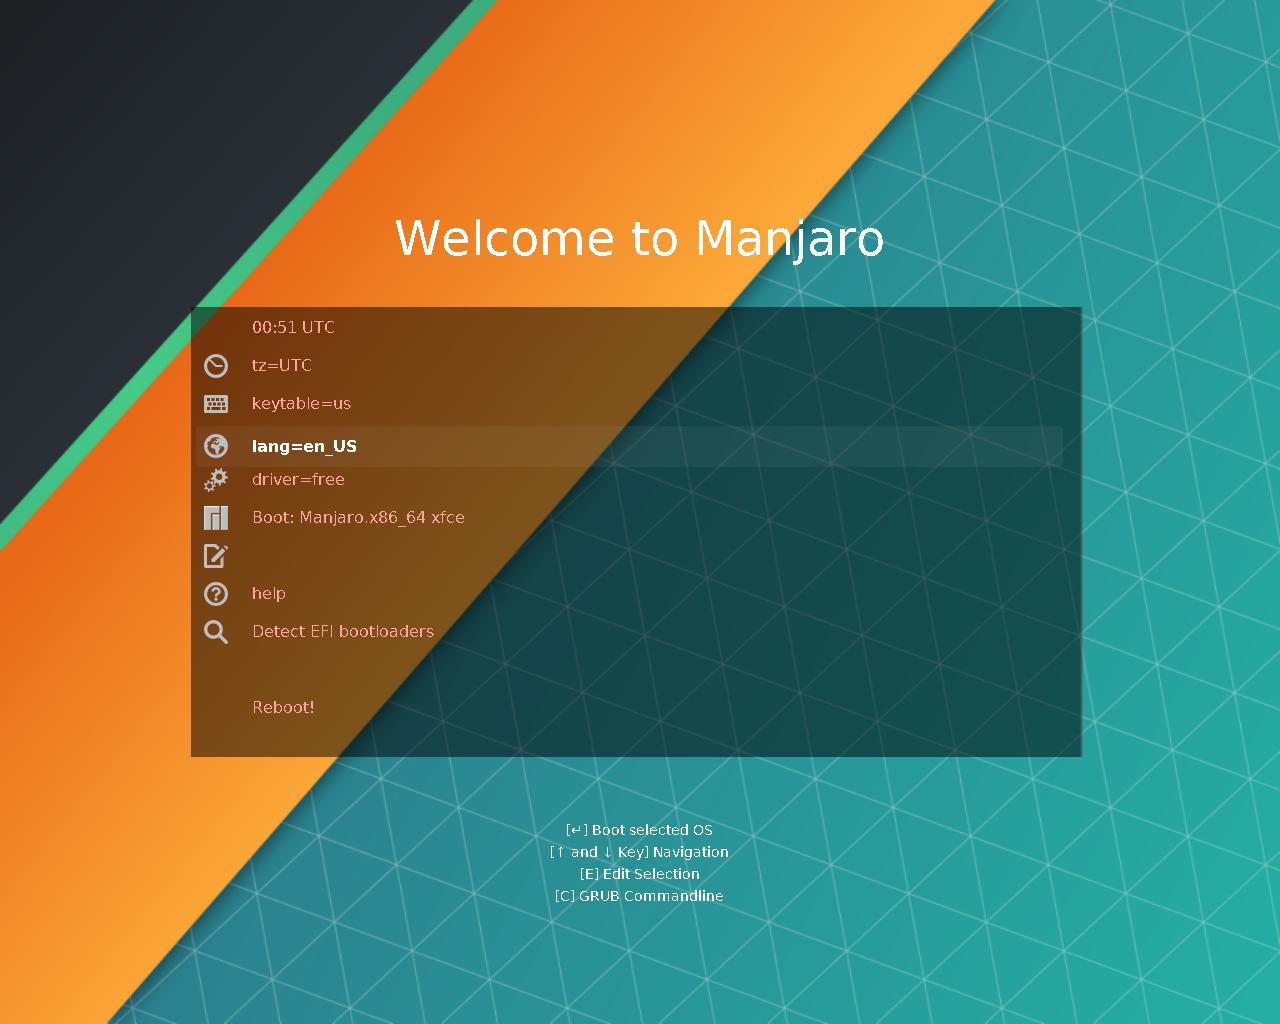 images/boot/UEFI-manjaro-menu.png